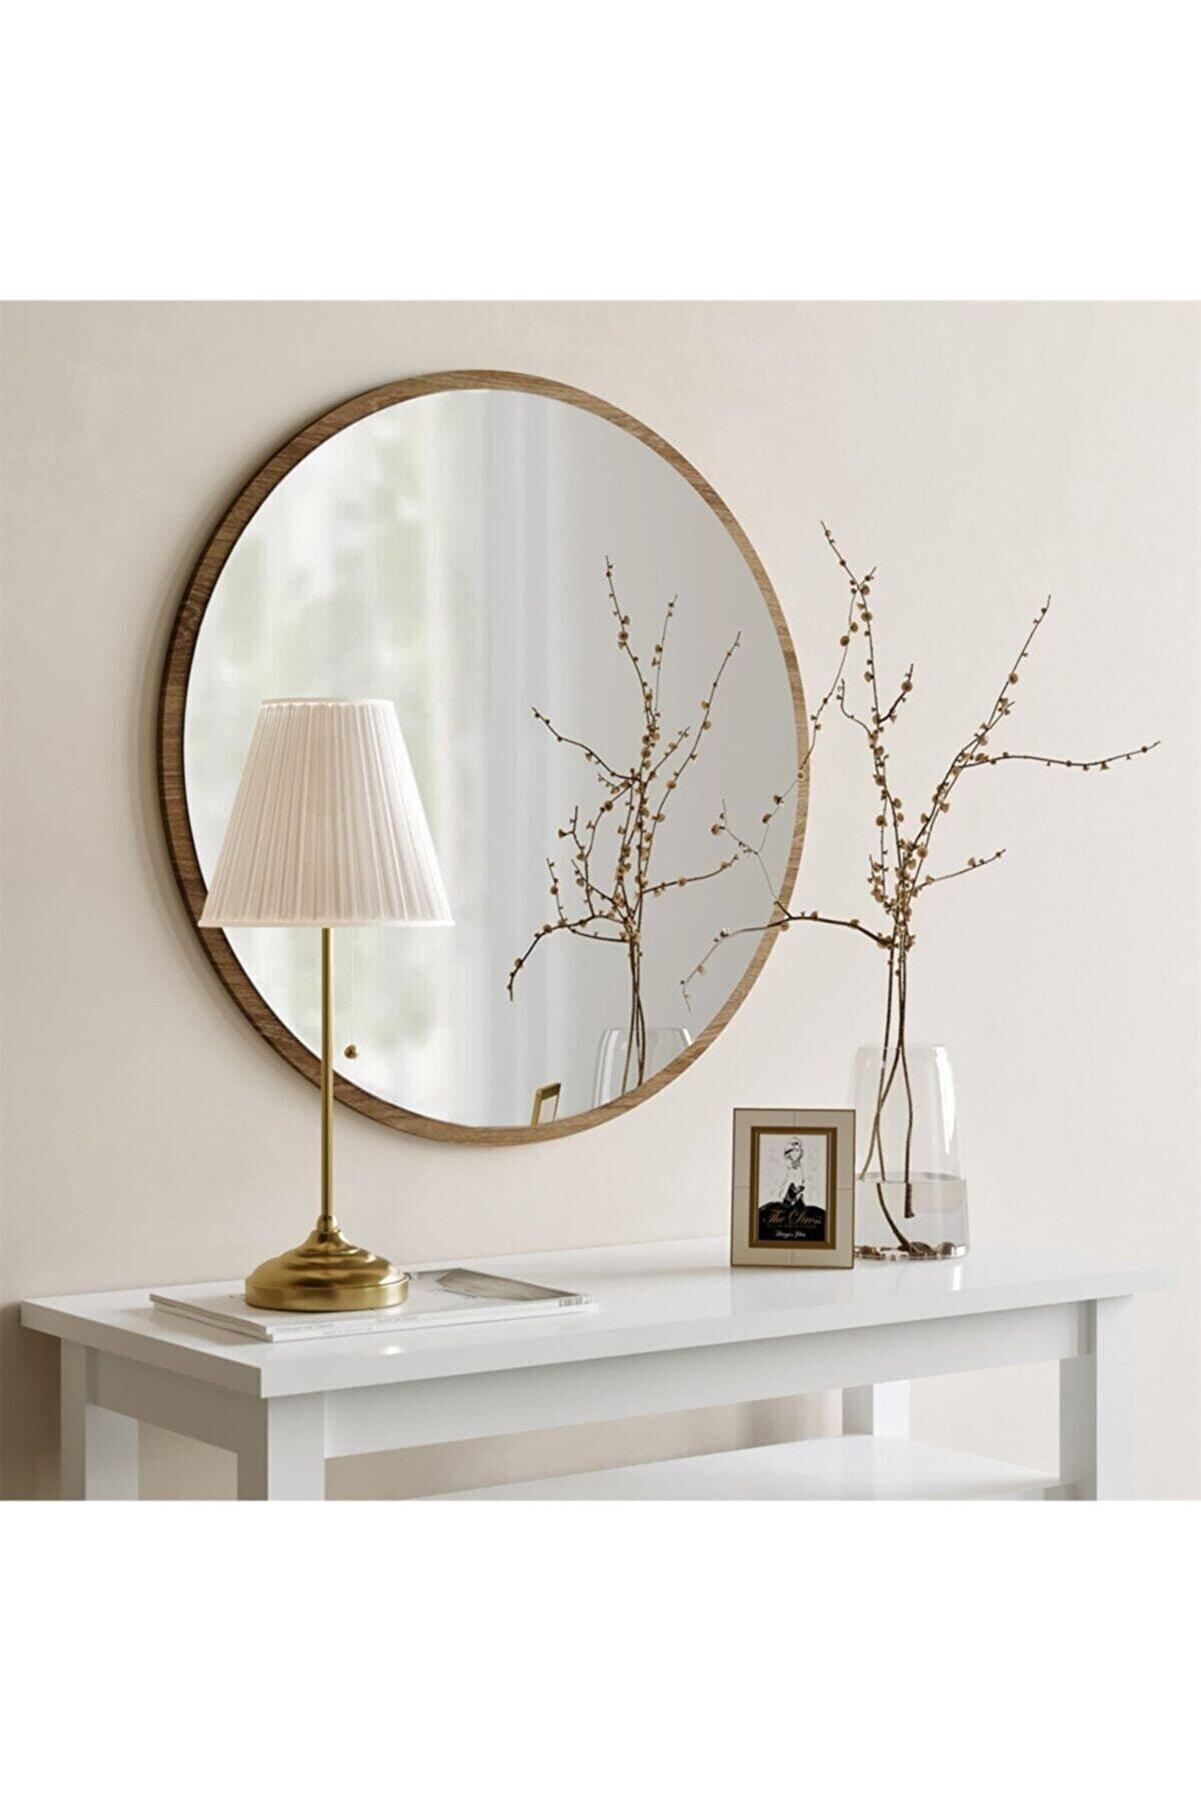 TARZDESİGN Tarz Design Yuvarlak Antre Hol Koridor Duvar Salon Mutfak Banyo Ofis Aynası 45 Cm